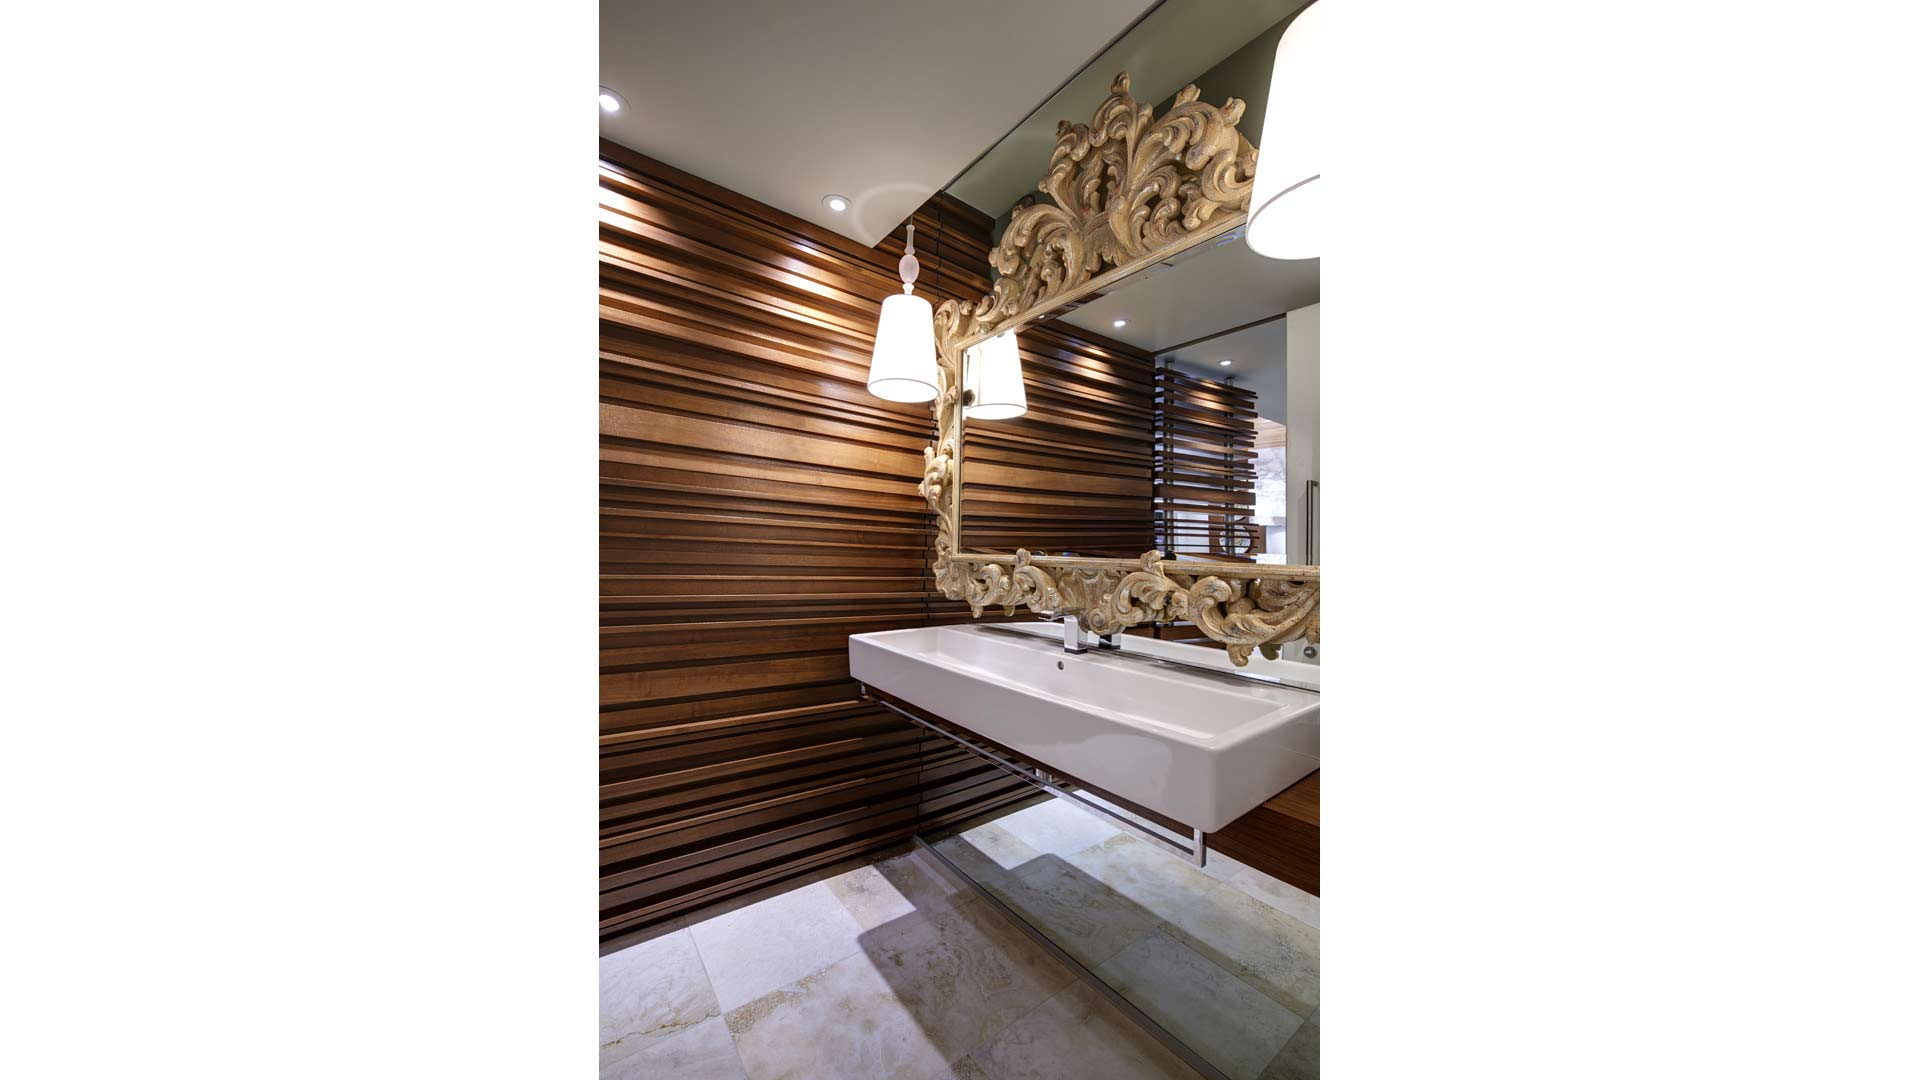 Adagio Penthouse Interior - Powder Room - Walnut Wall Detail - HAUS Architecture, Christopher Short, Indianapolis Architect